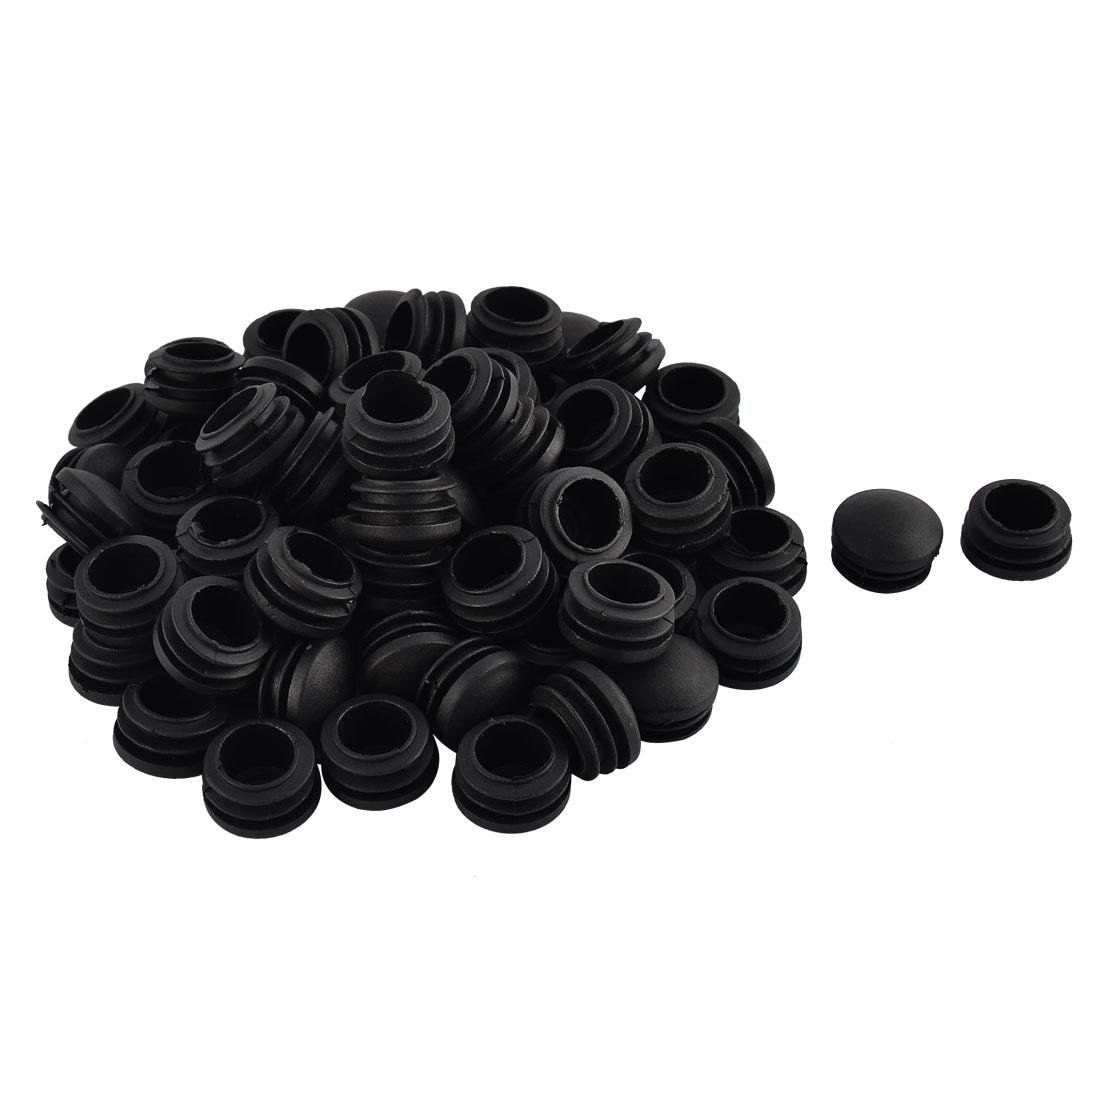 Furniture Table Chair Legs Plastic Round Head Tube Pipe Insert Cap Cover Black 25mm Dia 70pcs